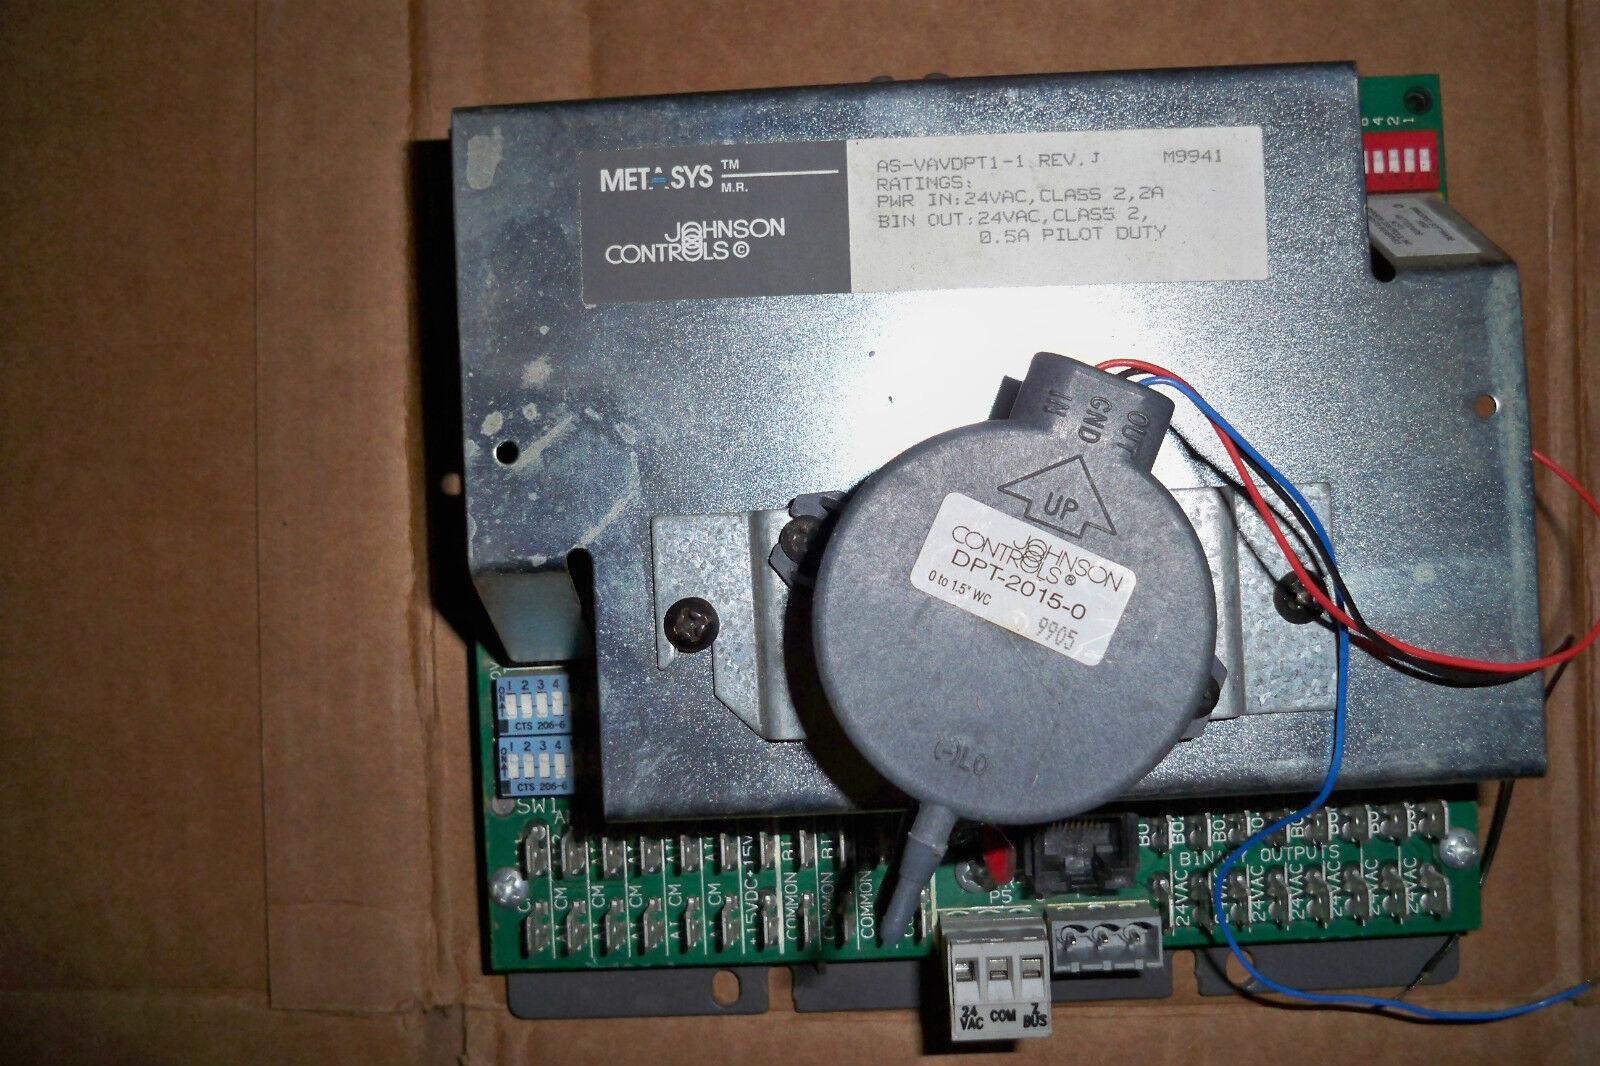 JOHNSON CONTROLS Variable air volume controller AS-VAV-DPT1-1 Rev. J